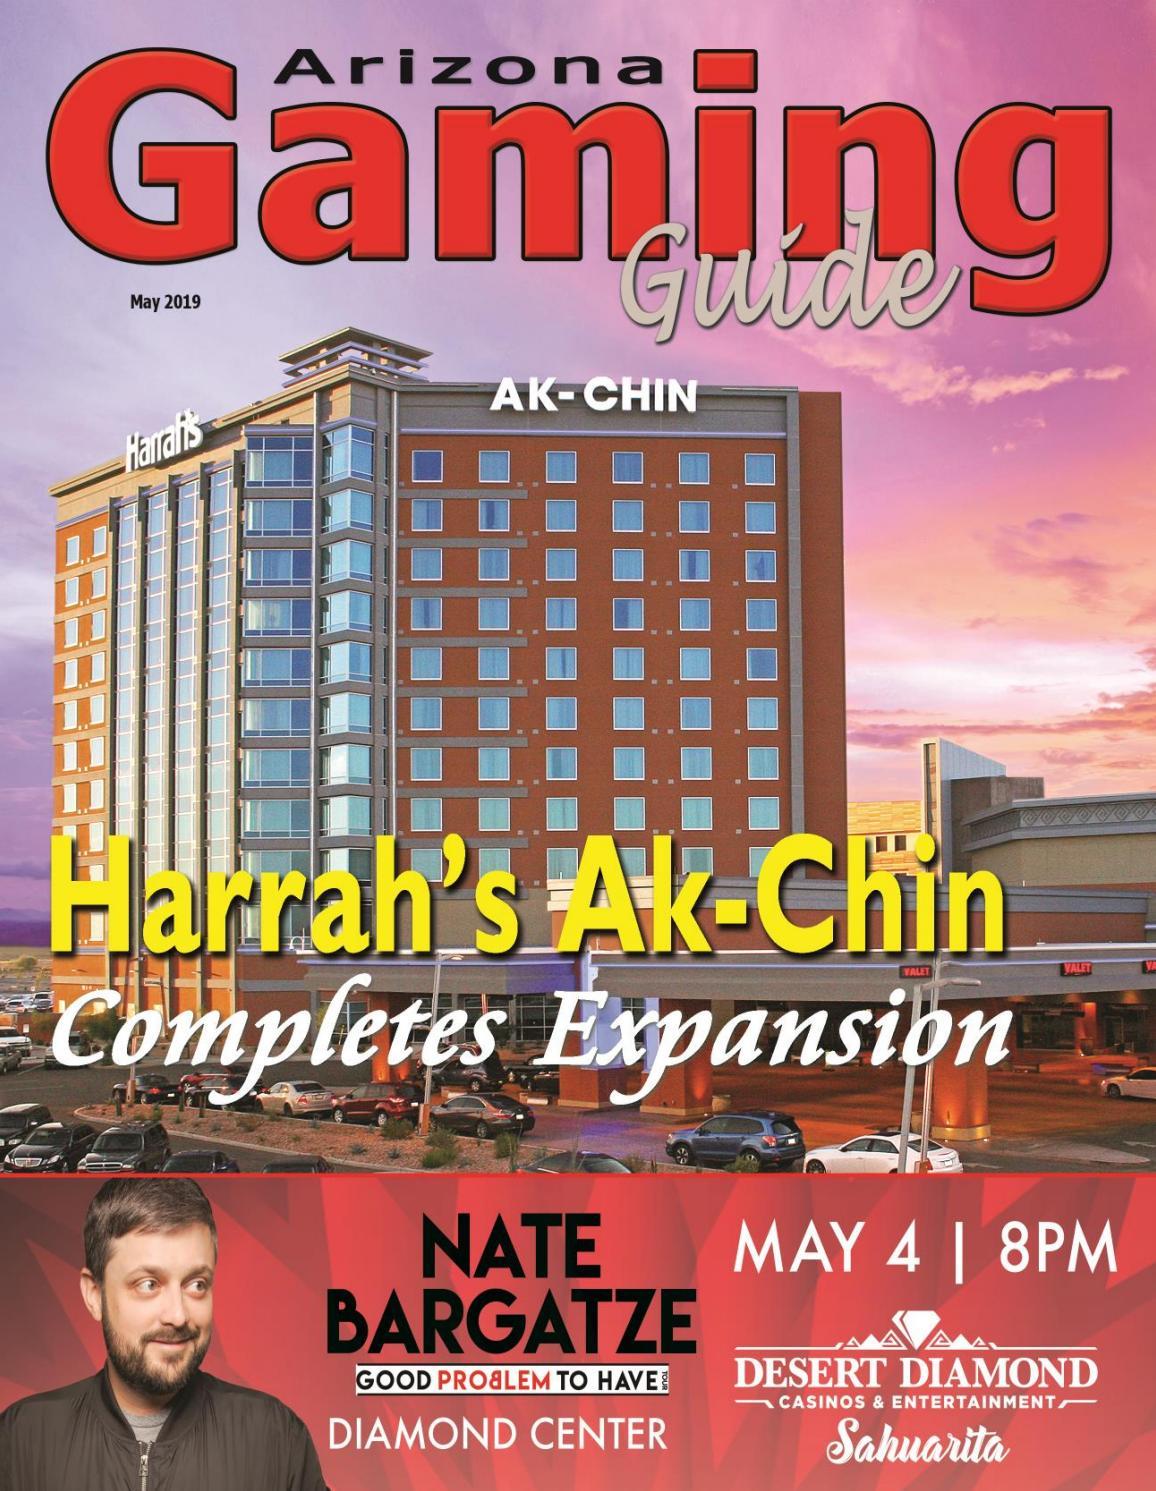 Slots 2019 gratis casino online legales en Santa Cruz - 99463